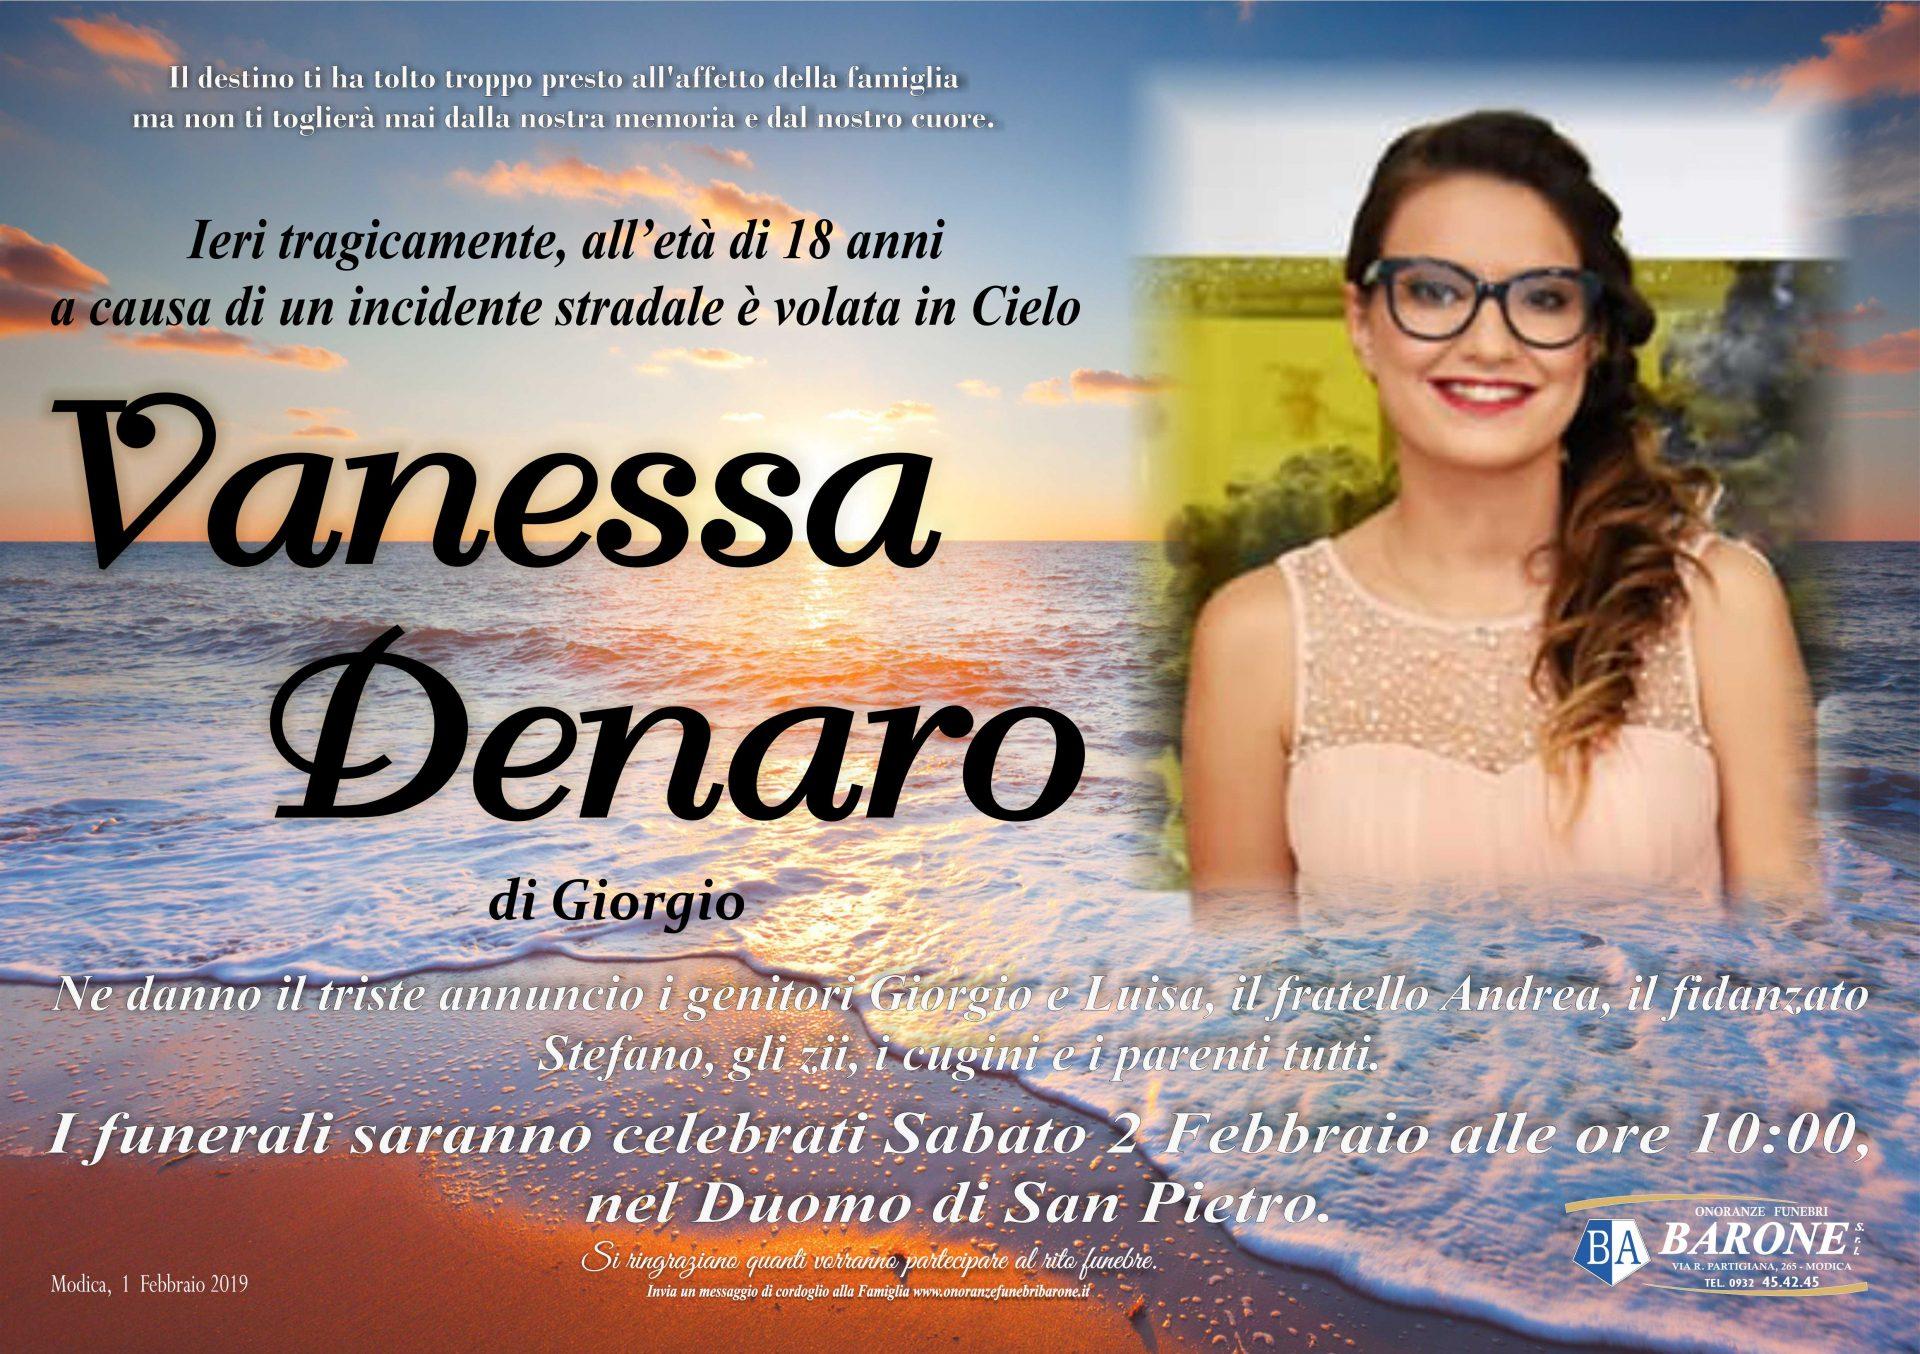 Vanessa Denaro